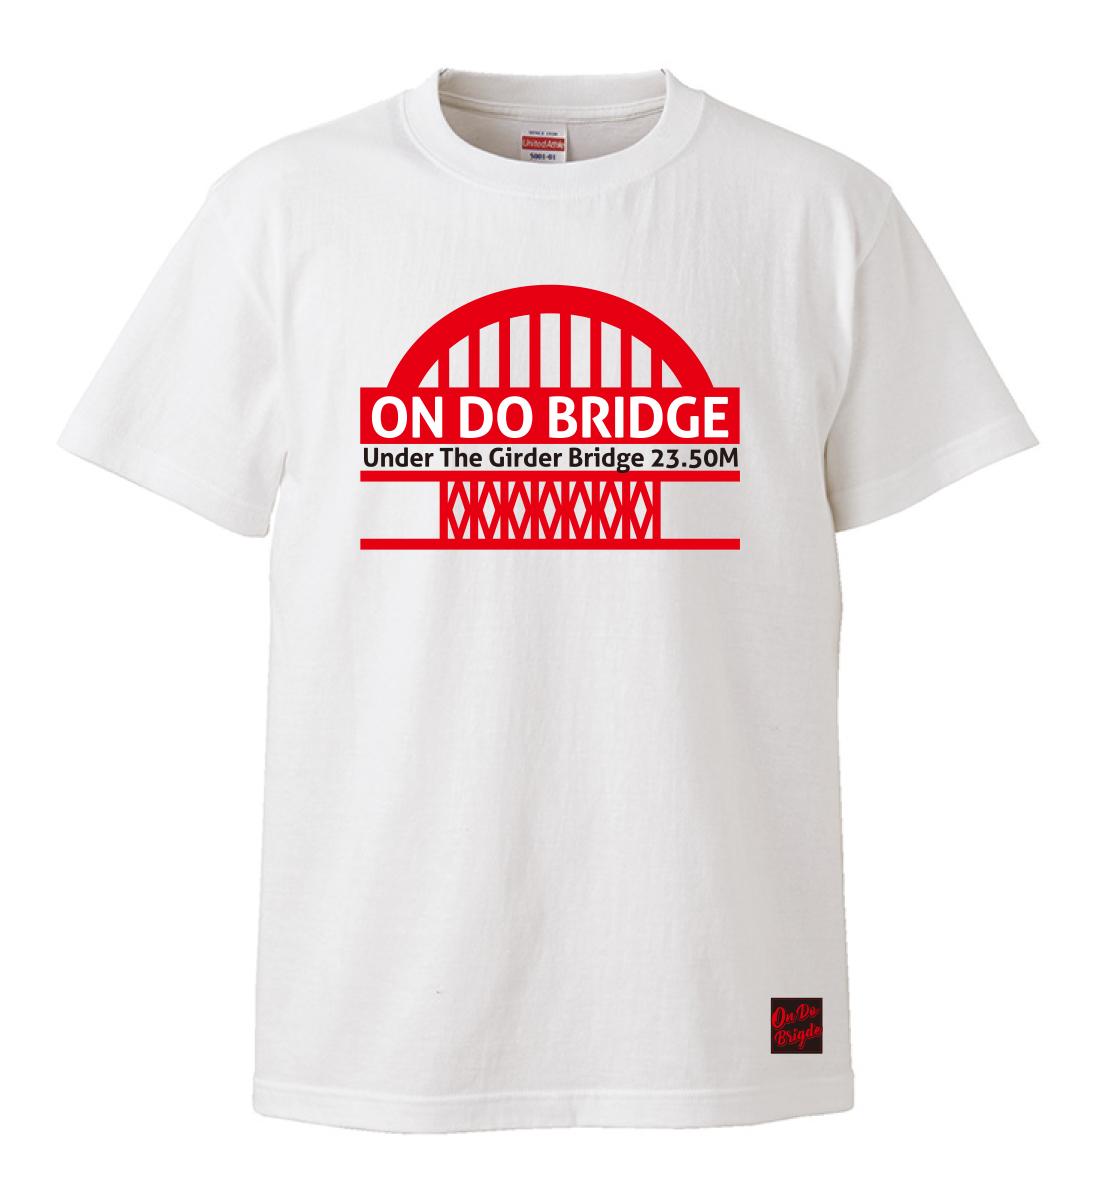 ONDOBRIDGE_t_teppan_white_M.jpg